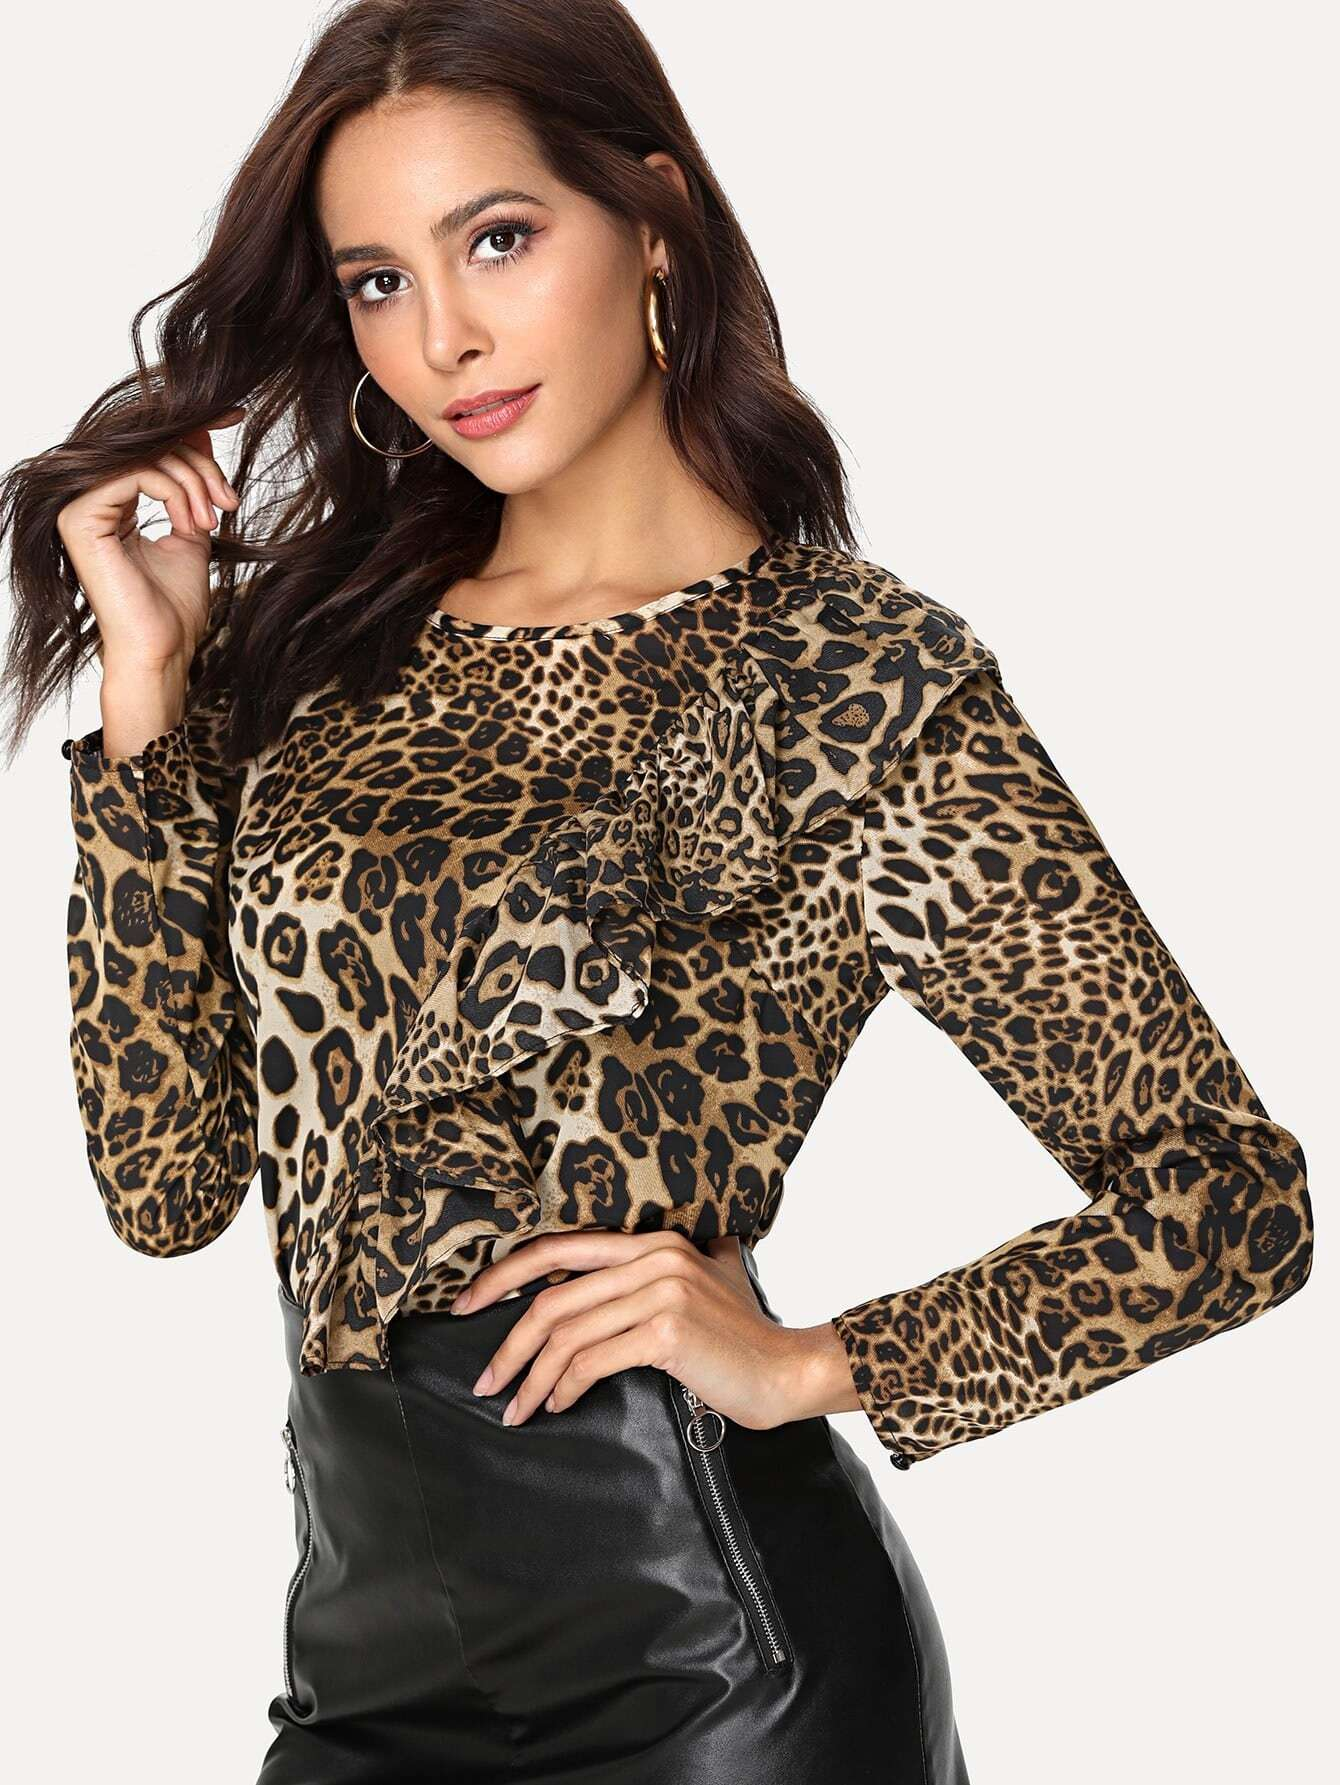 Ruffle Trim Leopard Top valentine golden brown pettiskirt dress leopard heart ruffle bow white top 1 8y mapsa0229